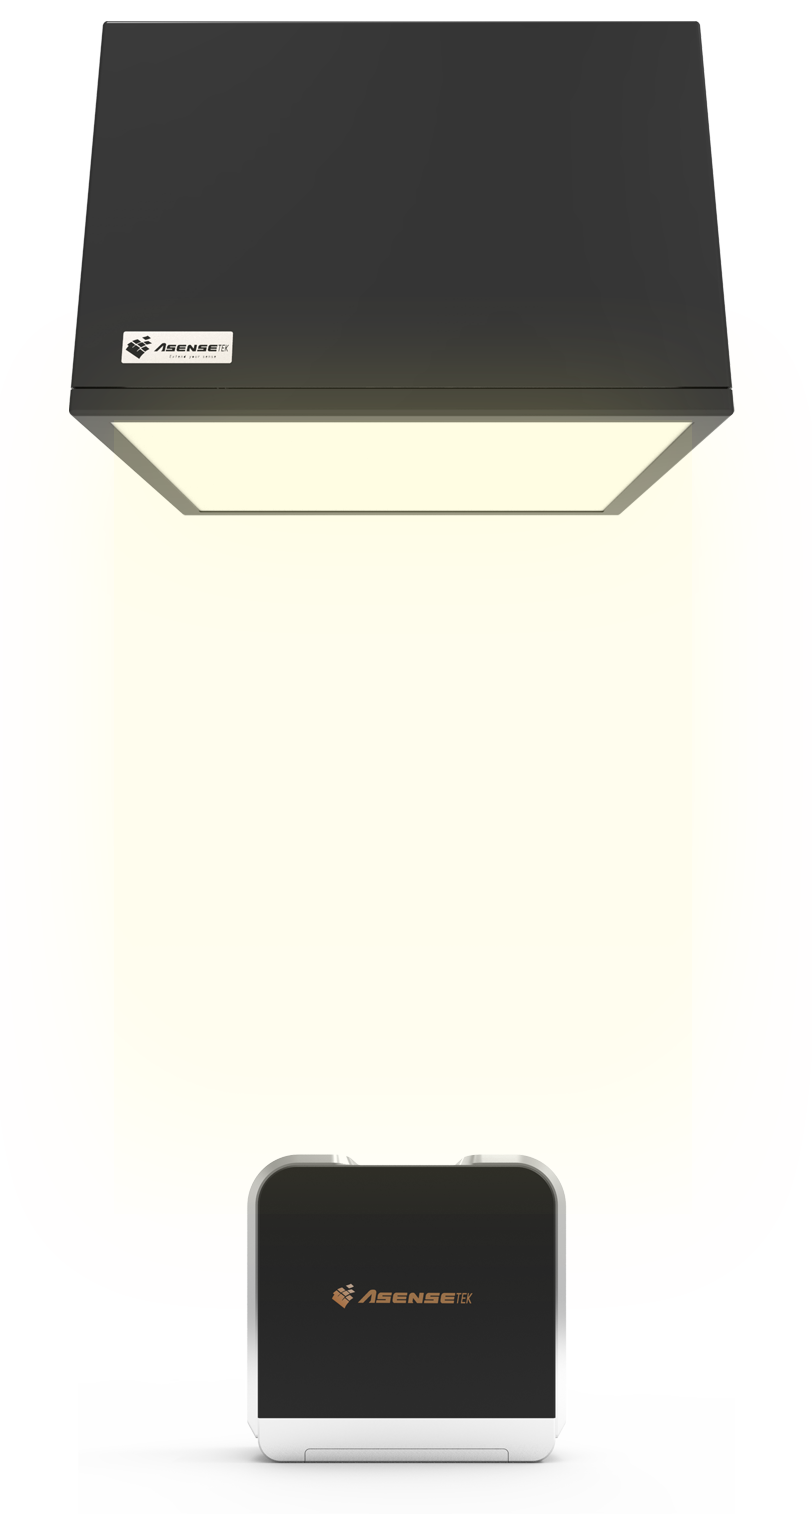 Asensetek Lichtsimulator